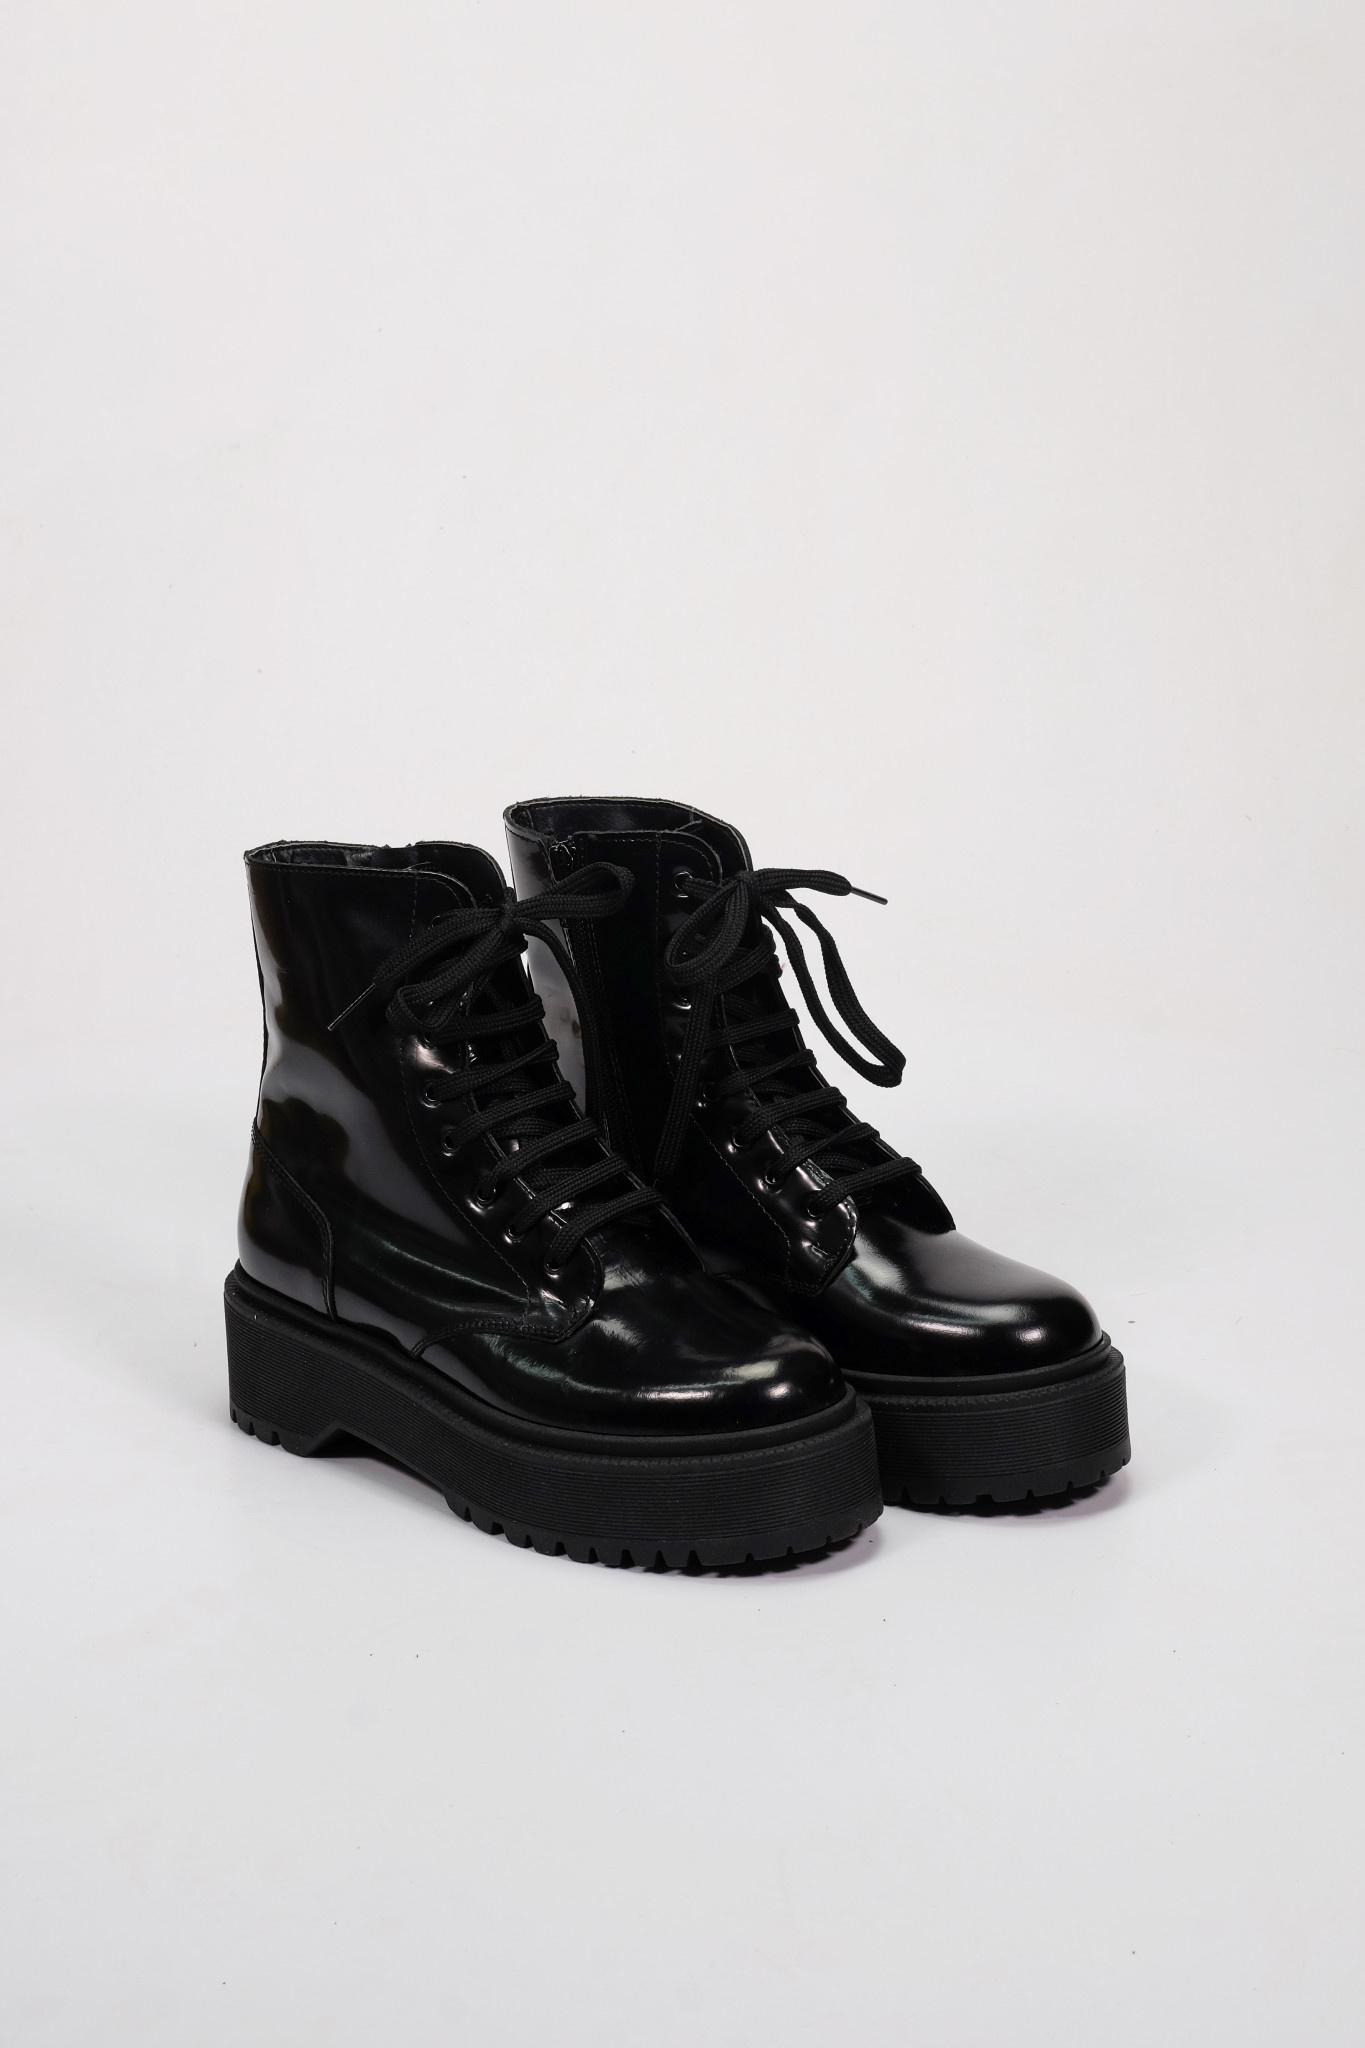 Factory Store Lima zwart glanzend